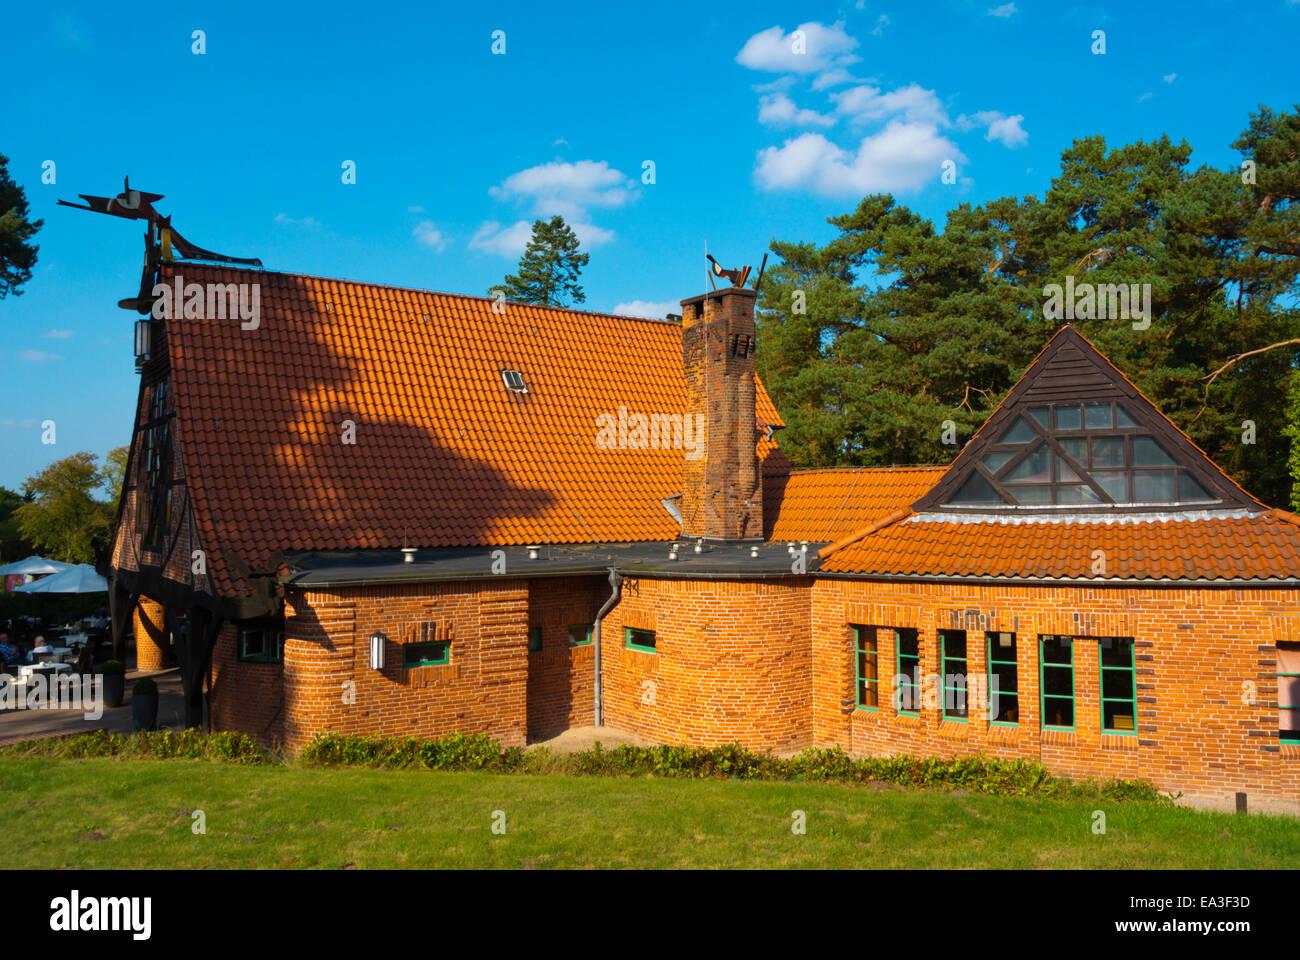 Künstlerhäuser Worpswede, Künstler Recidency, Worpswede Dorf in der Nähe von Bremen, Teufelsmoor, Stockbild